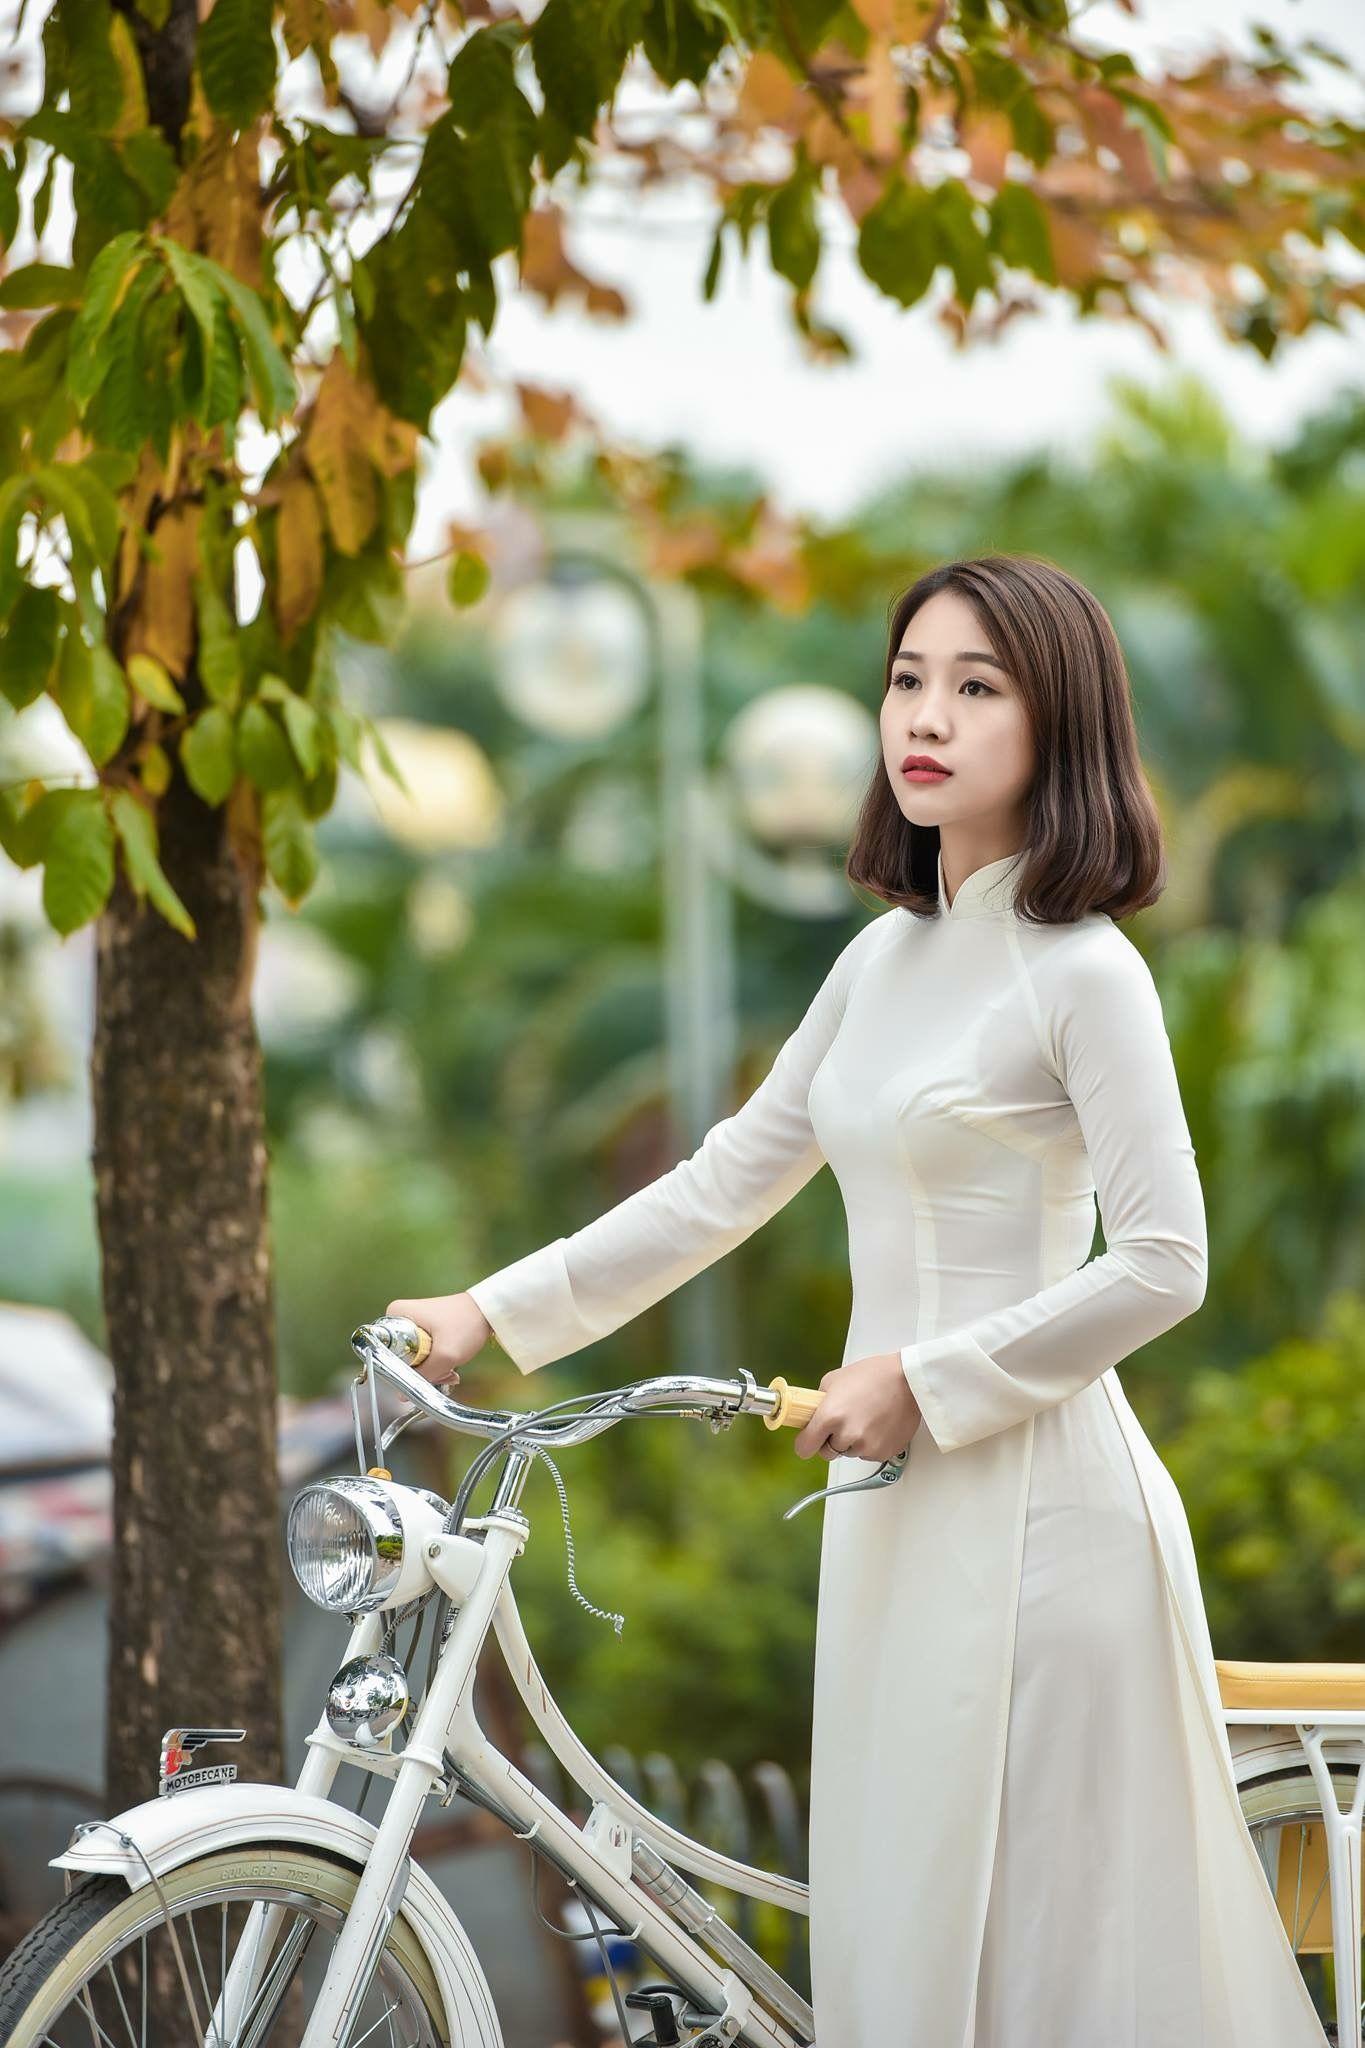 Ao Dai Trang White Dress Fashion Asian Woman